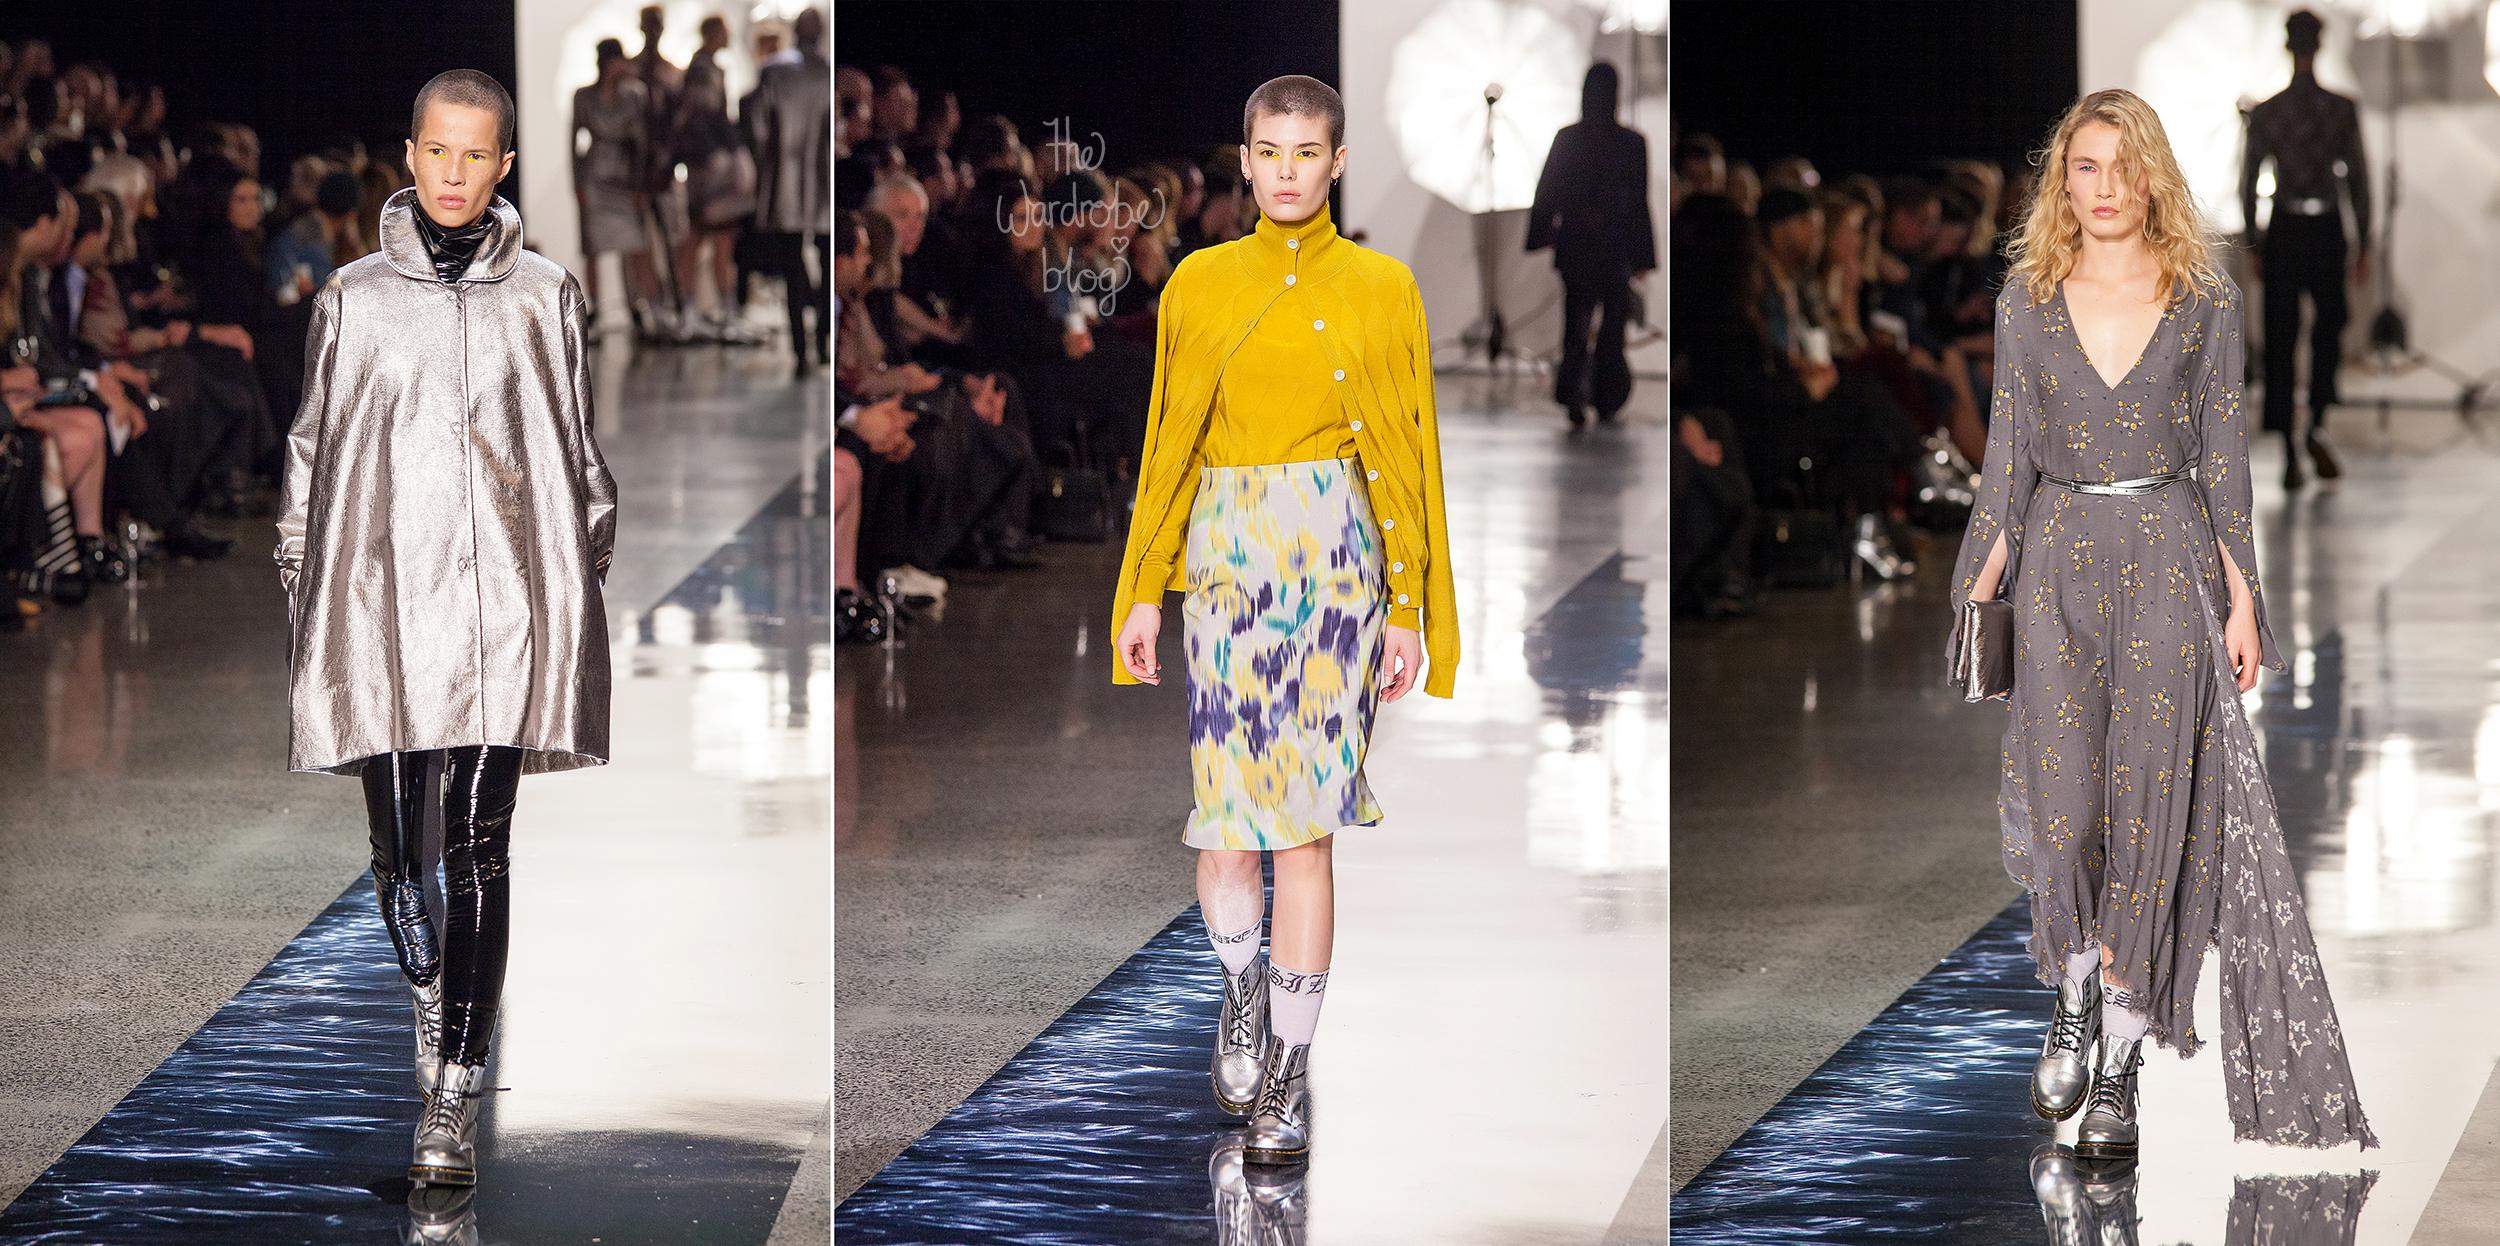 Zambesi-Runway-Outfits-Models